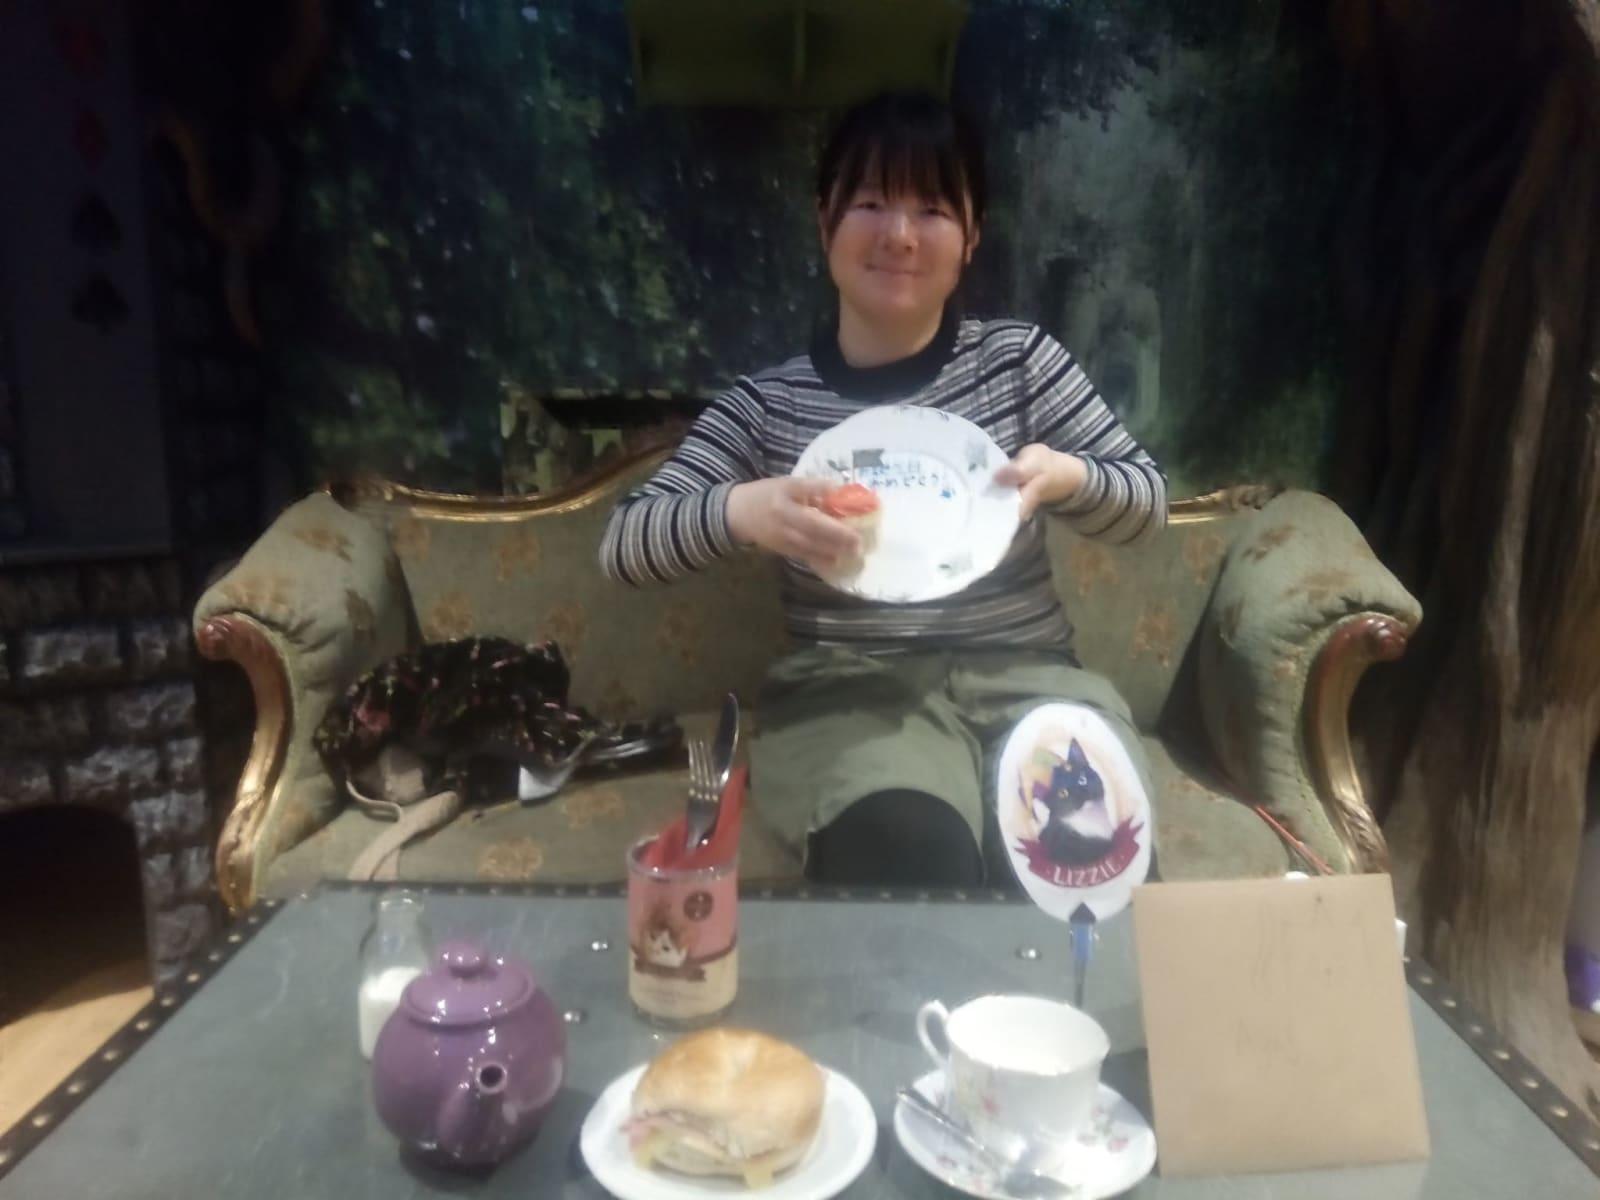 Aya from London, United Kingdom